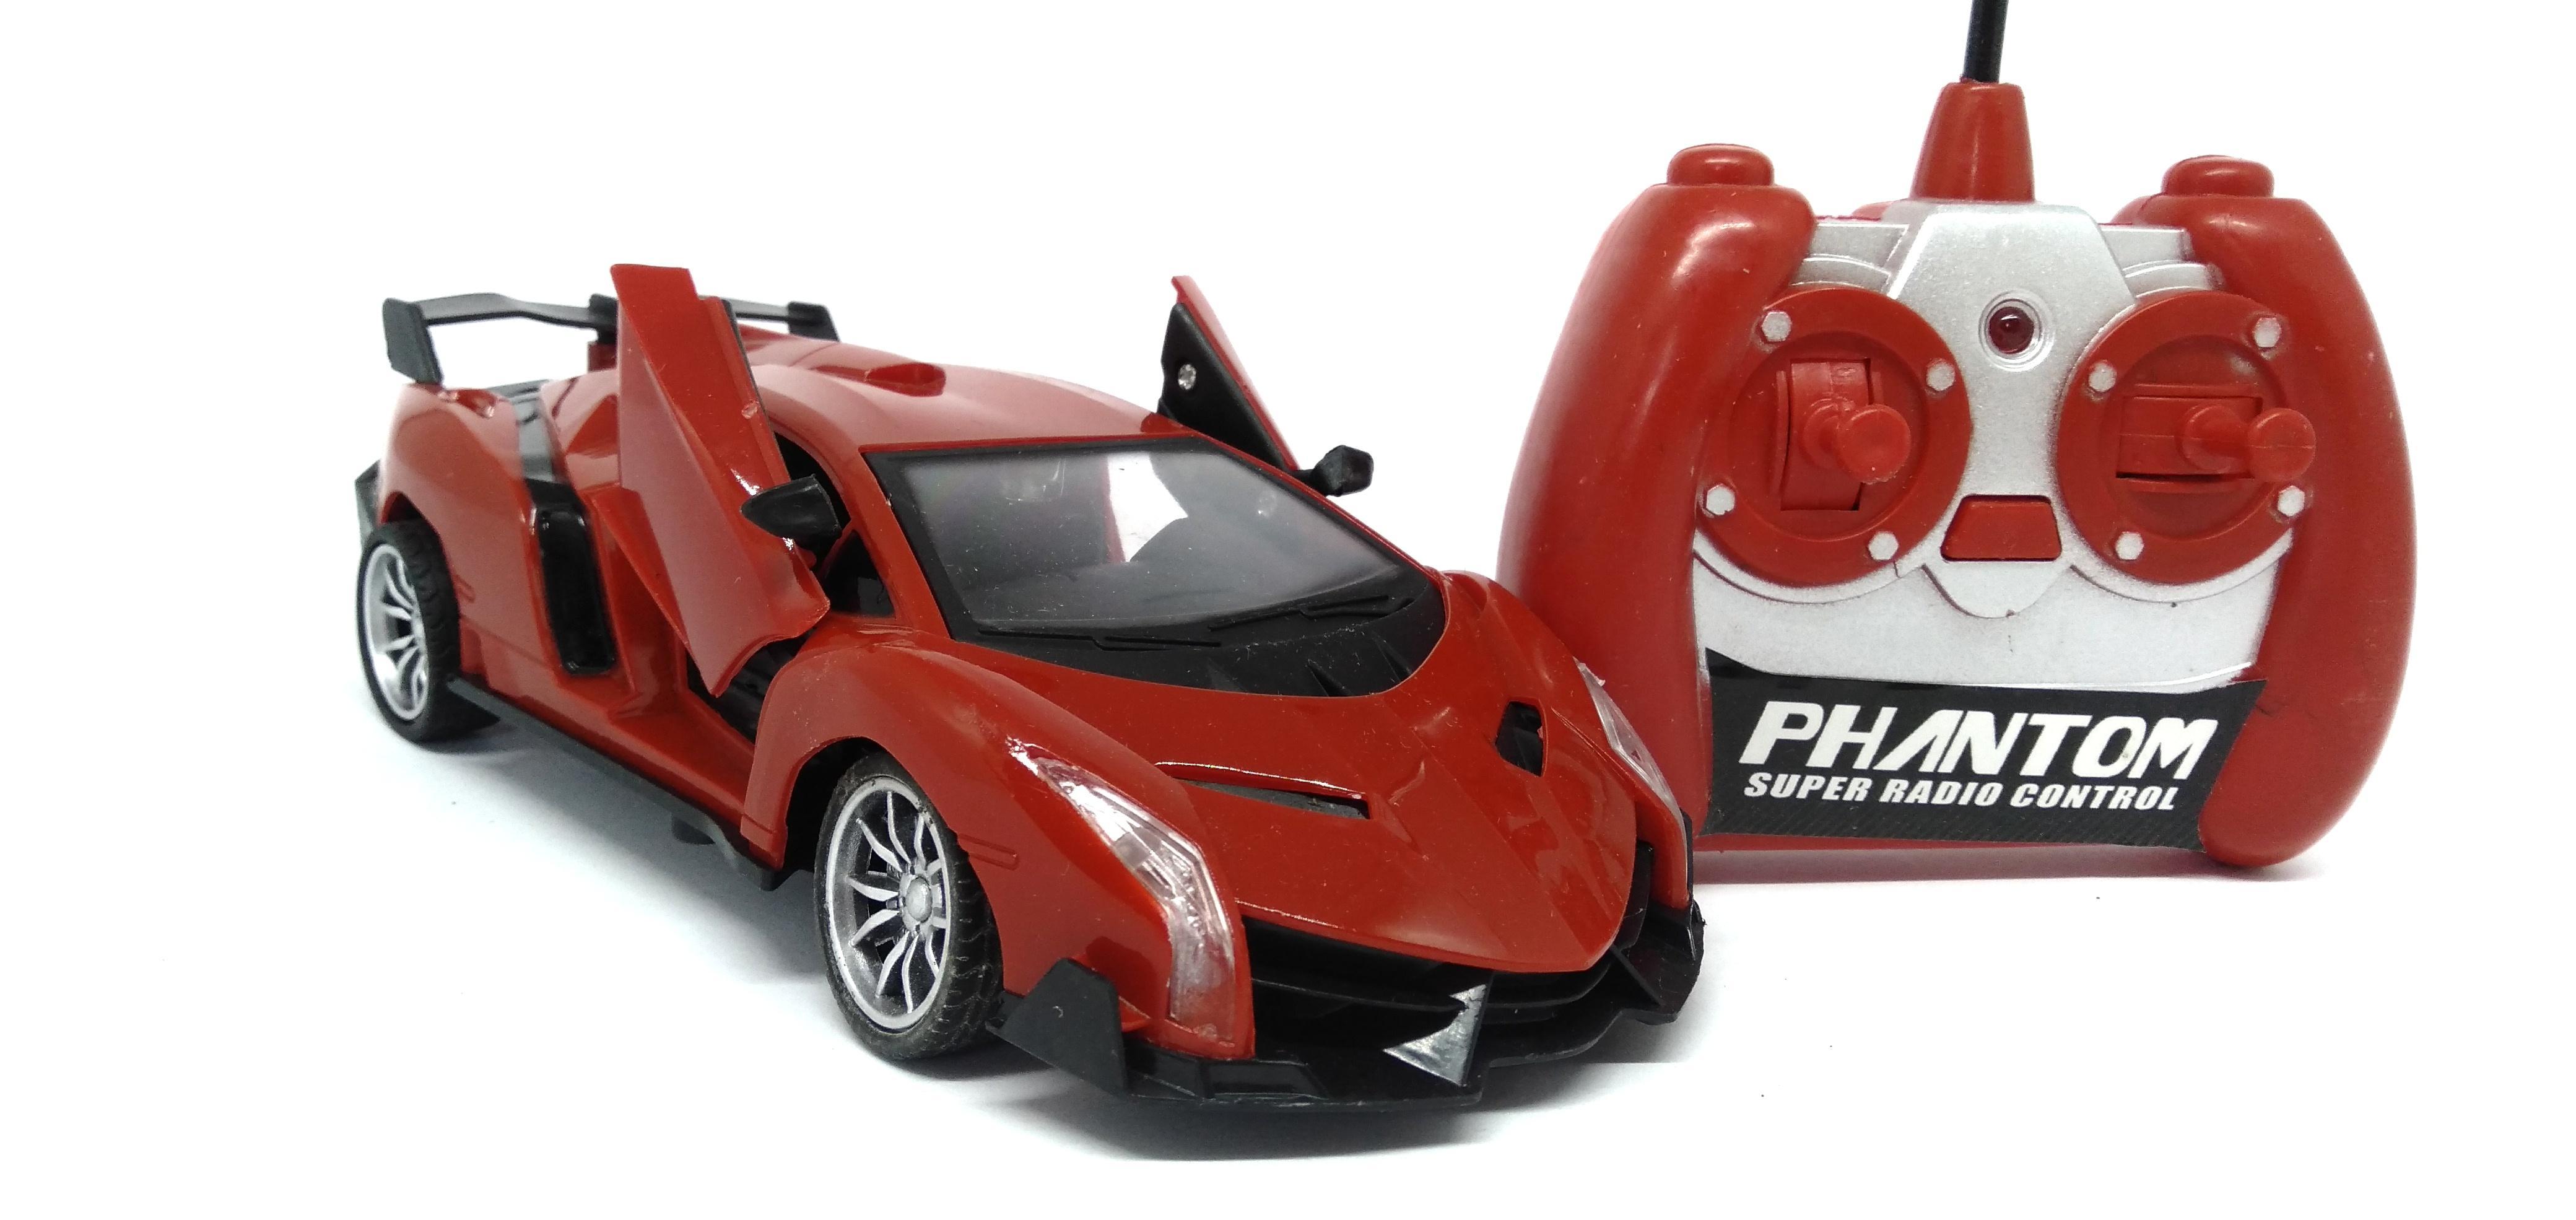 Mainan Mobil Remote Control Rc Lamborghini Buka Pintu By Wahana Toys.